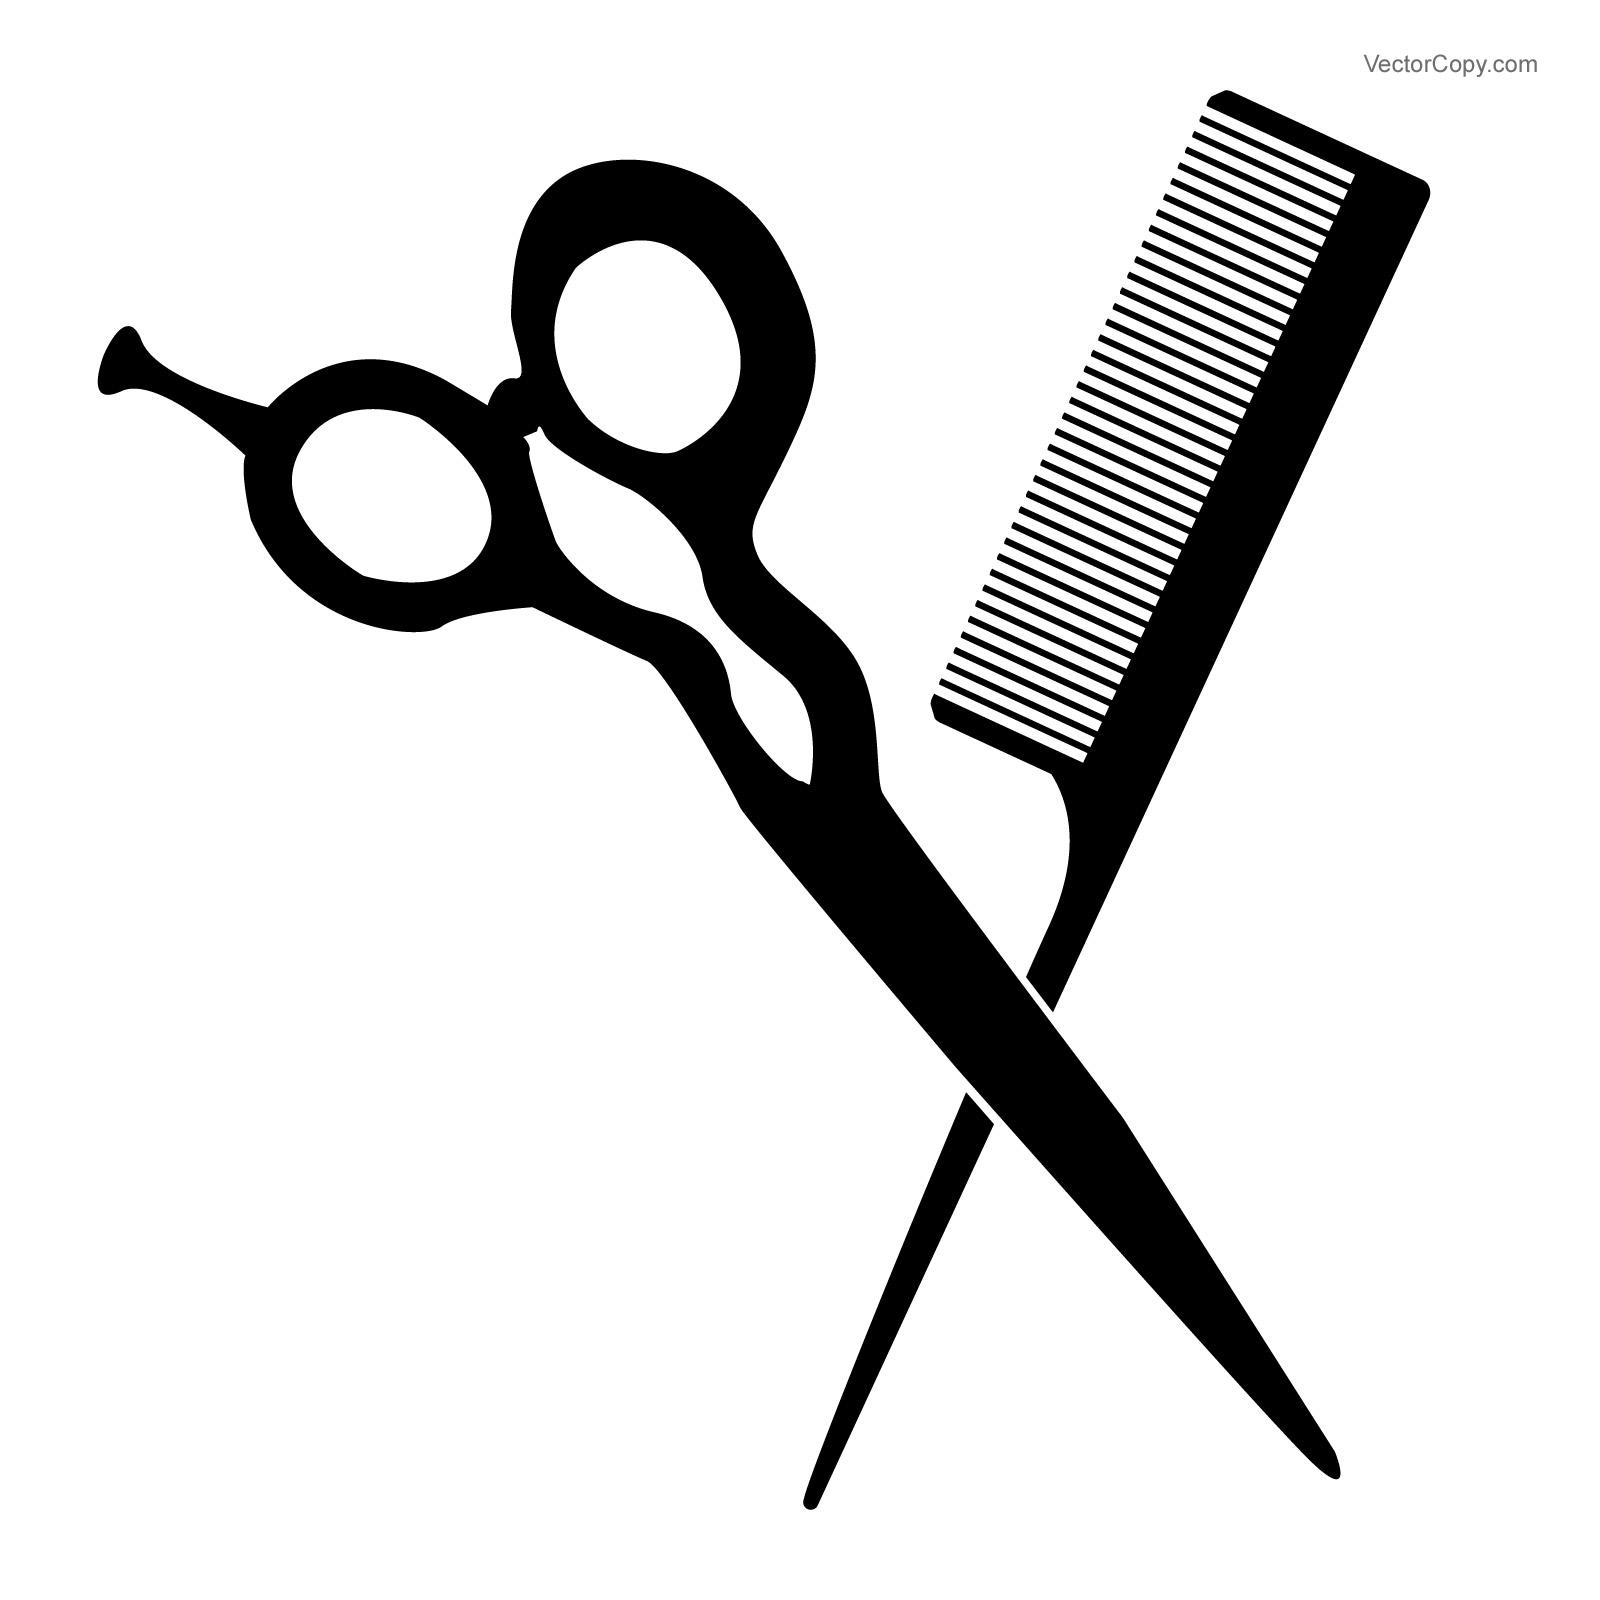 Scissors free scissor and comb clip art 2.